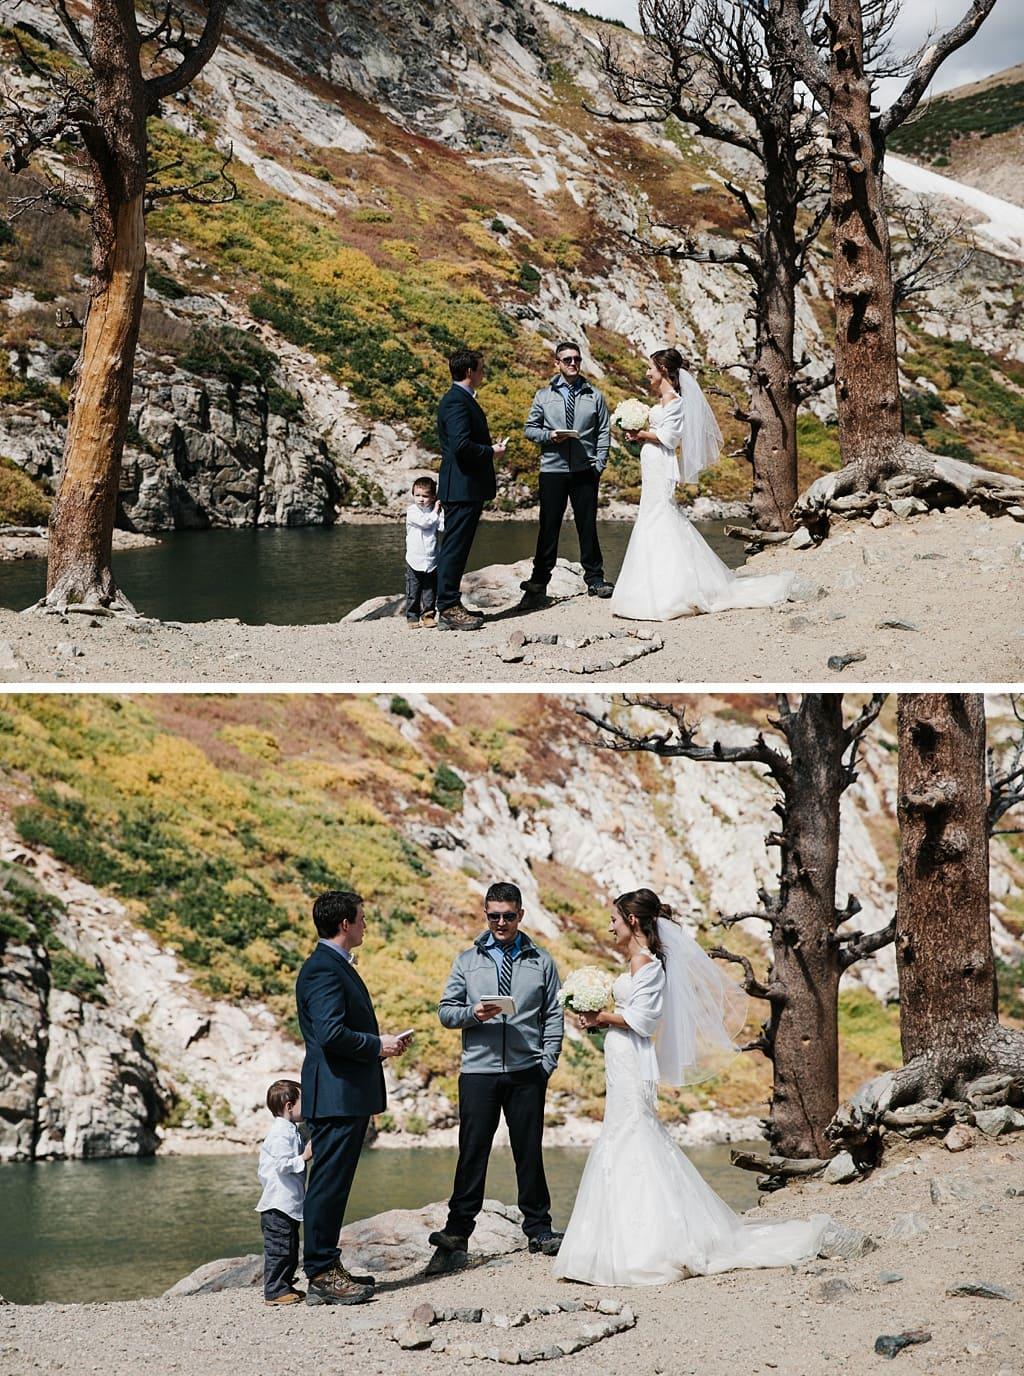 St. Mary's Glacier Elopement hiking wedding in Colorado